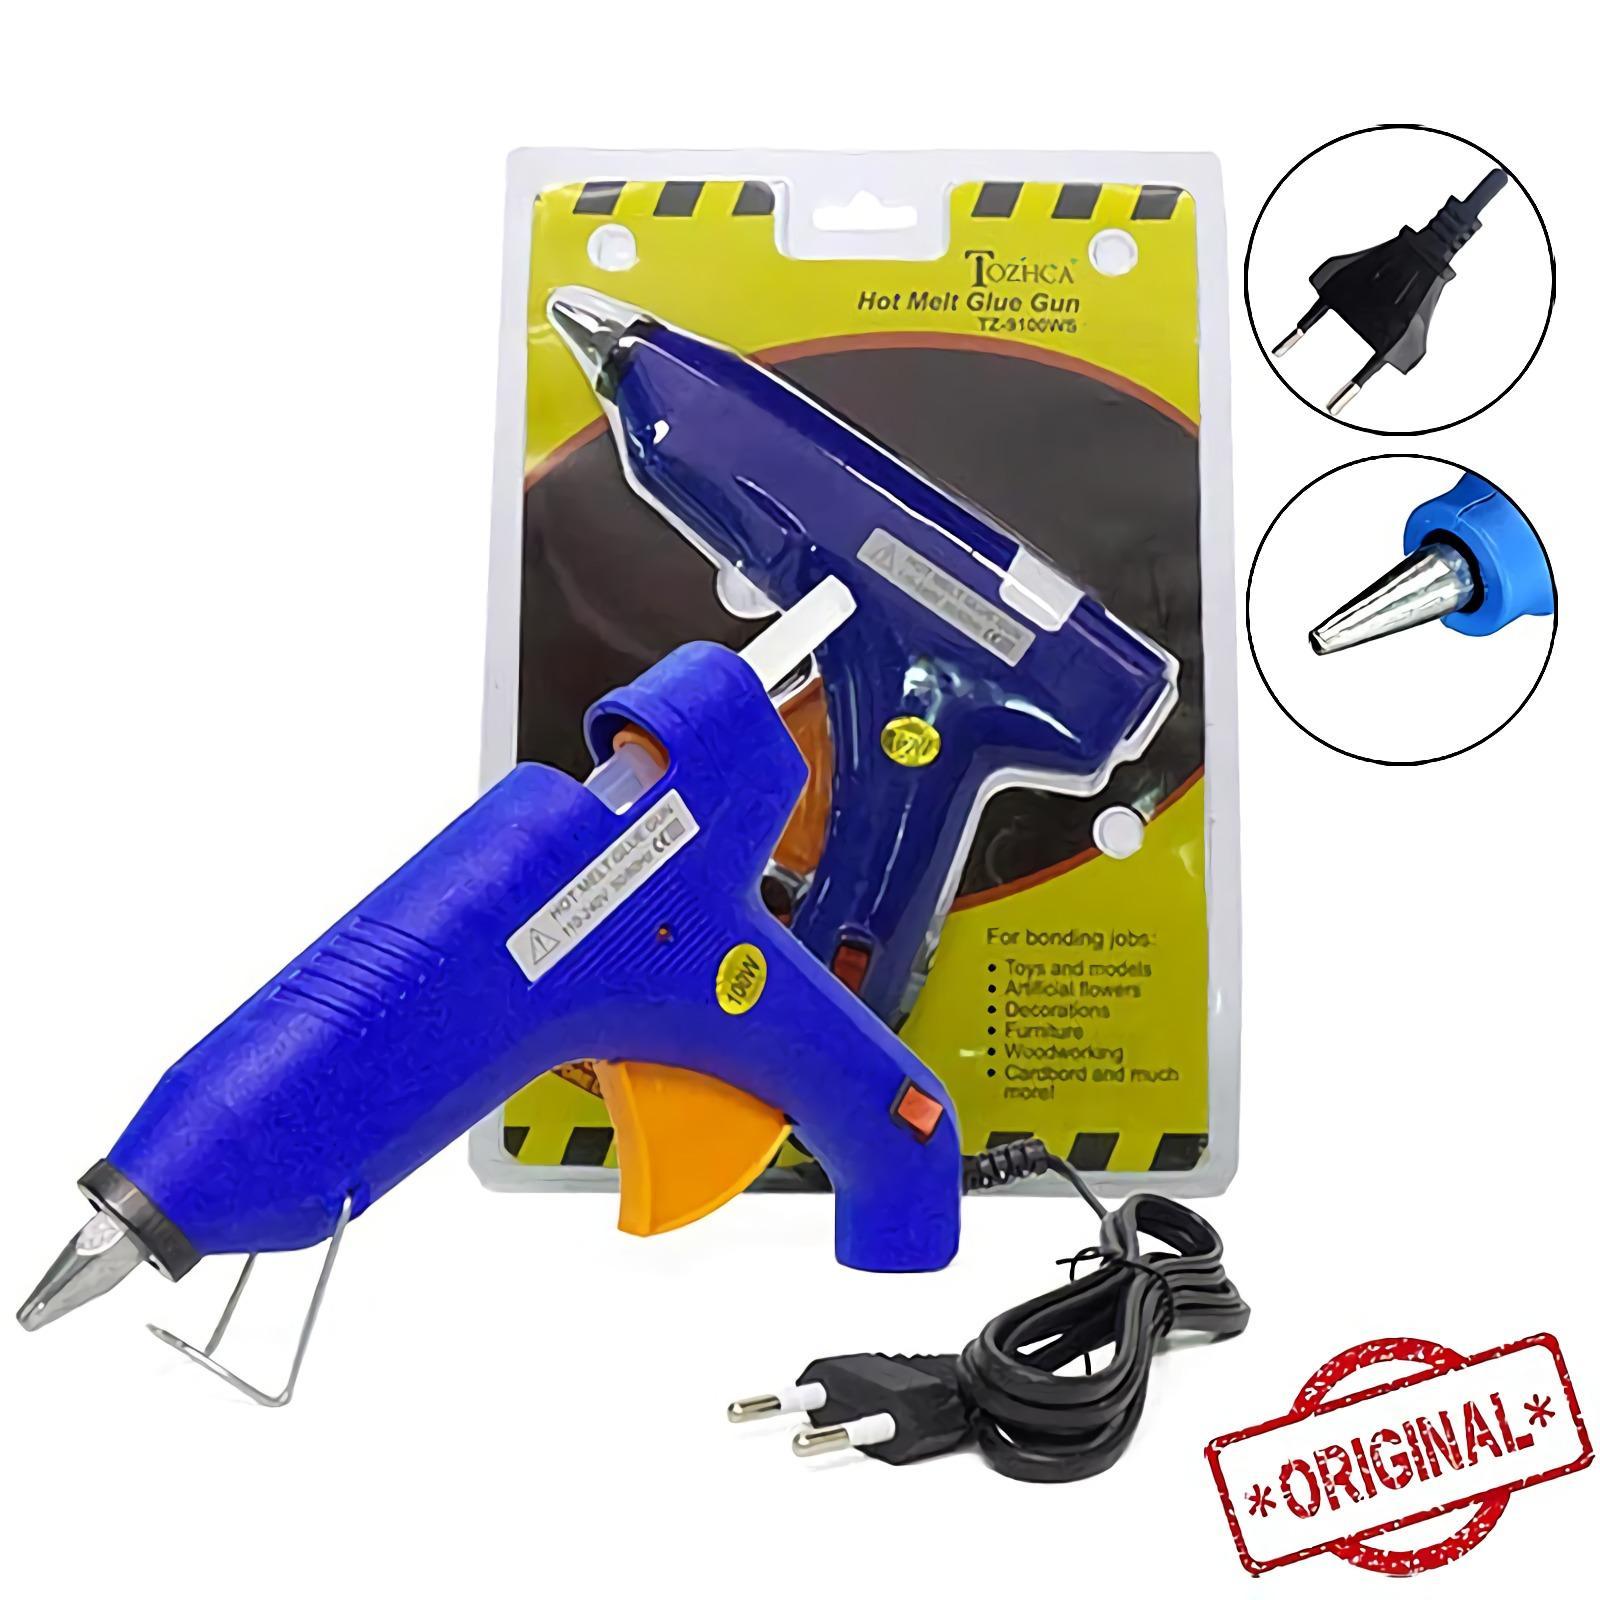 OHOME Alat Lem Tembak 100 Watt Glue Gun Set MS-TZ-9100WS Biru